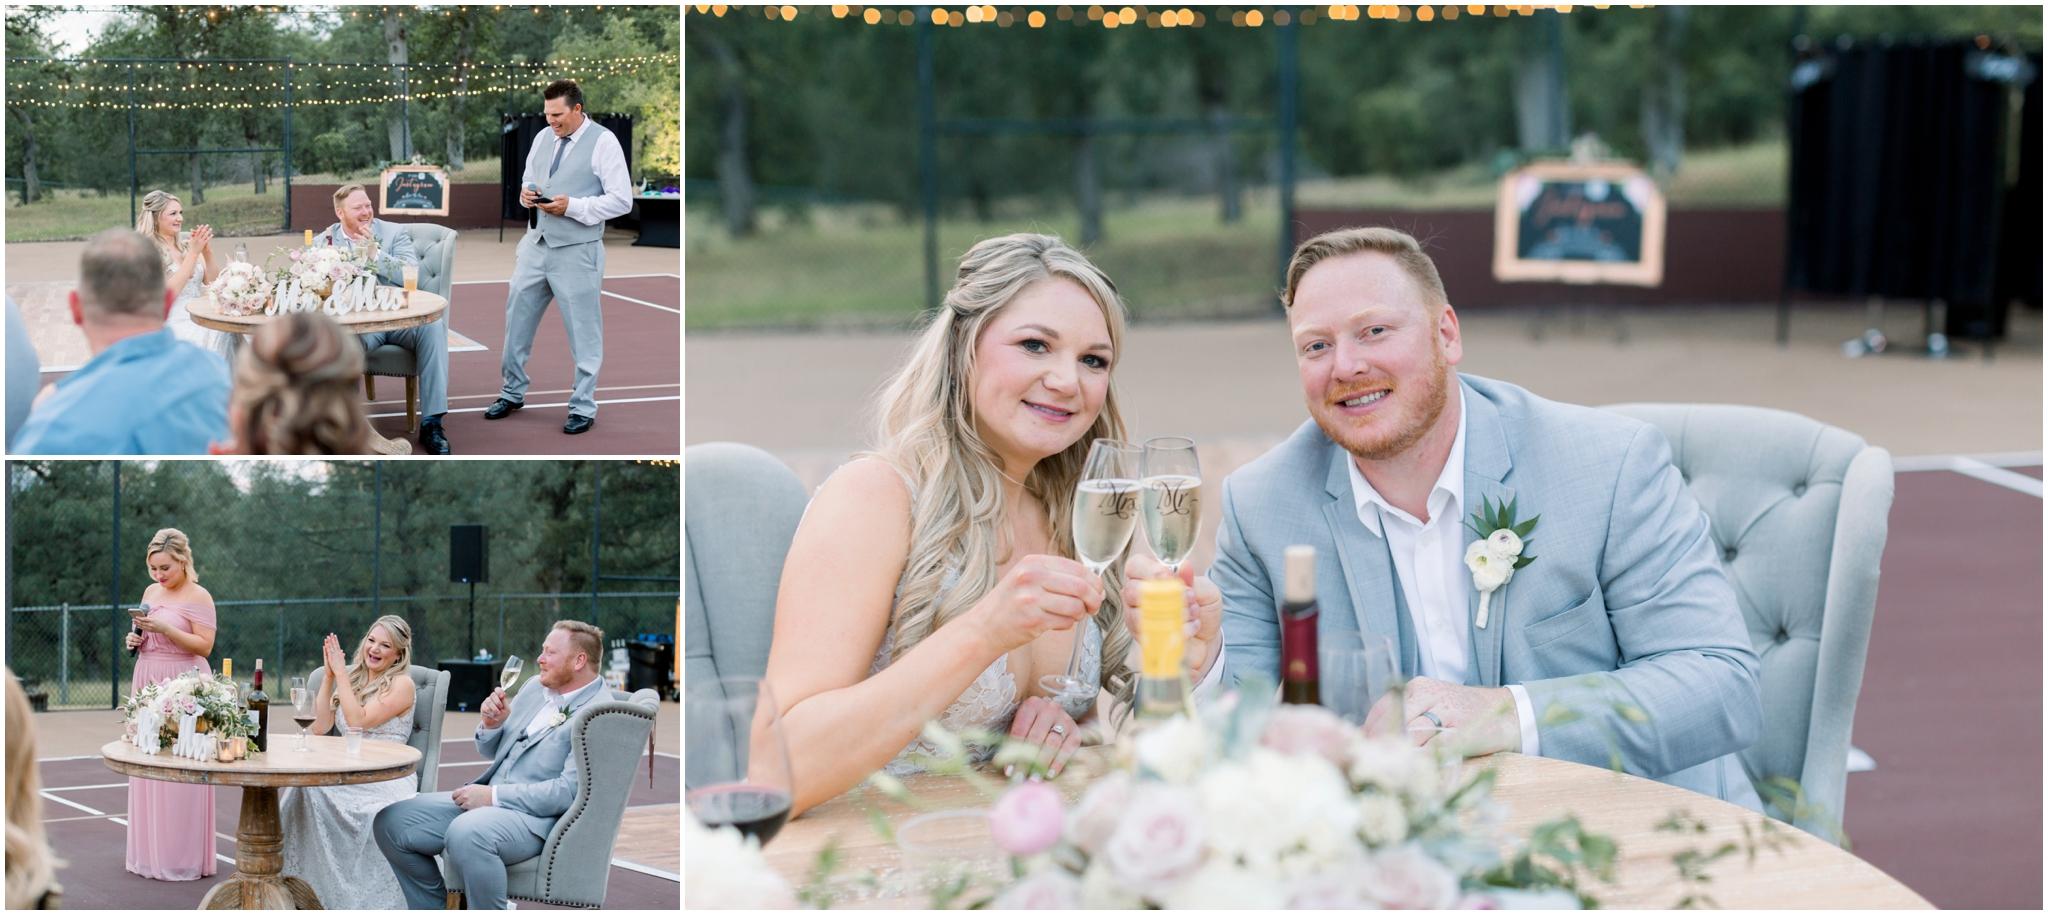 cindy_joseph_wedding_redding_blog_0036.jpg